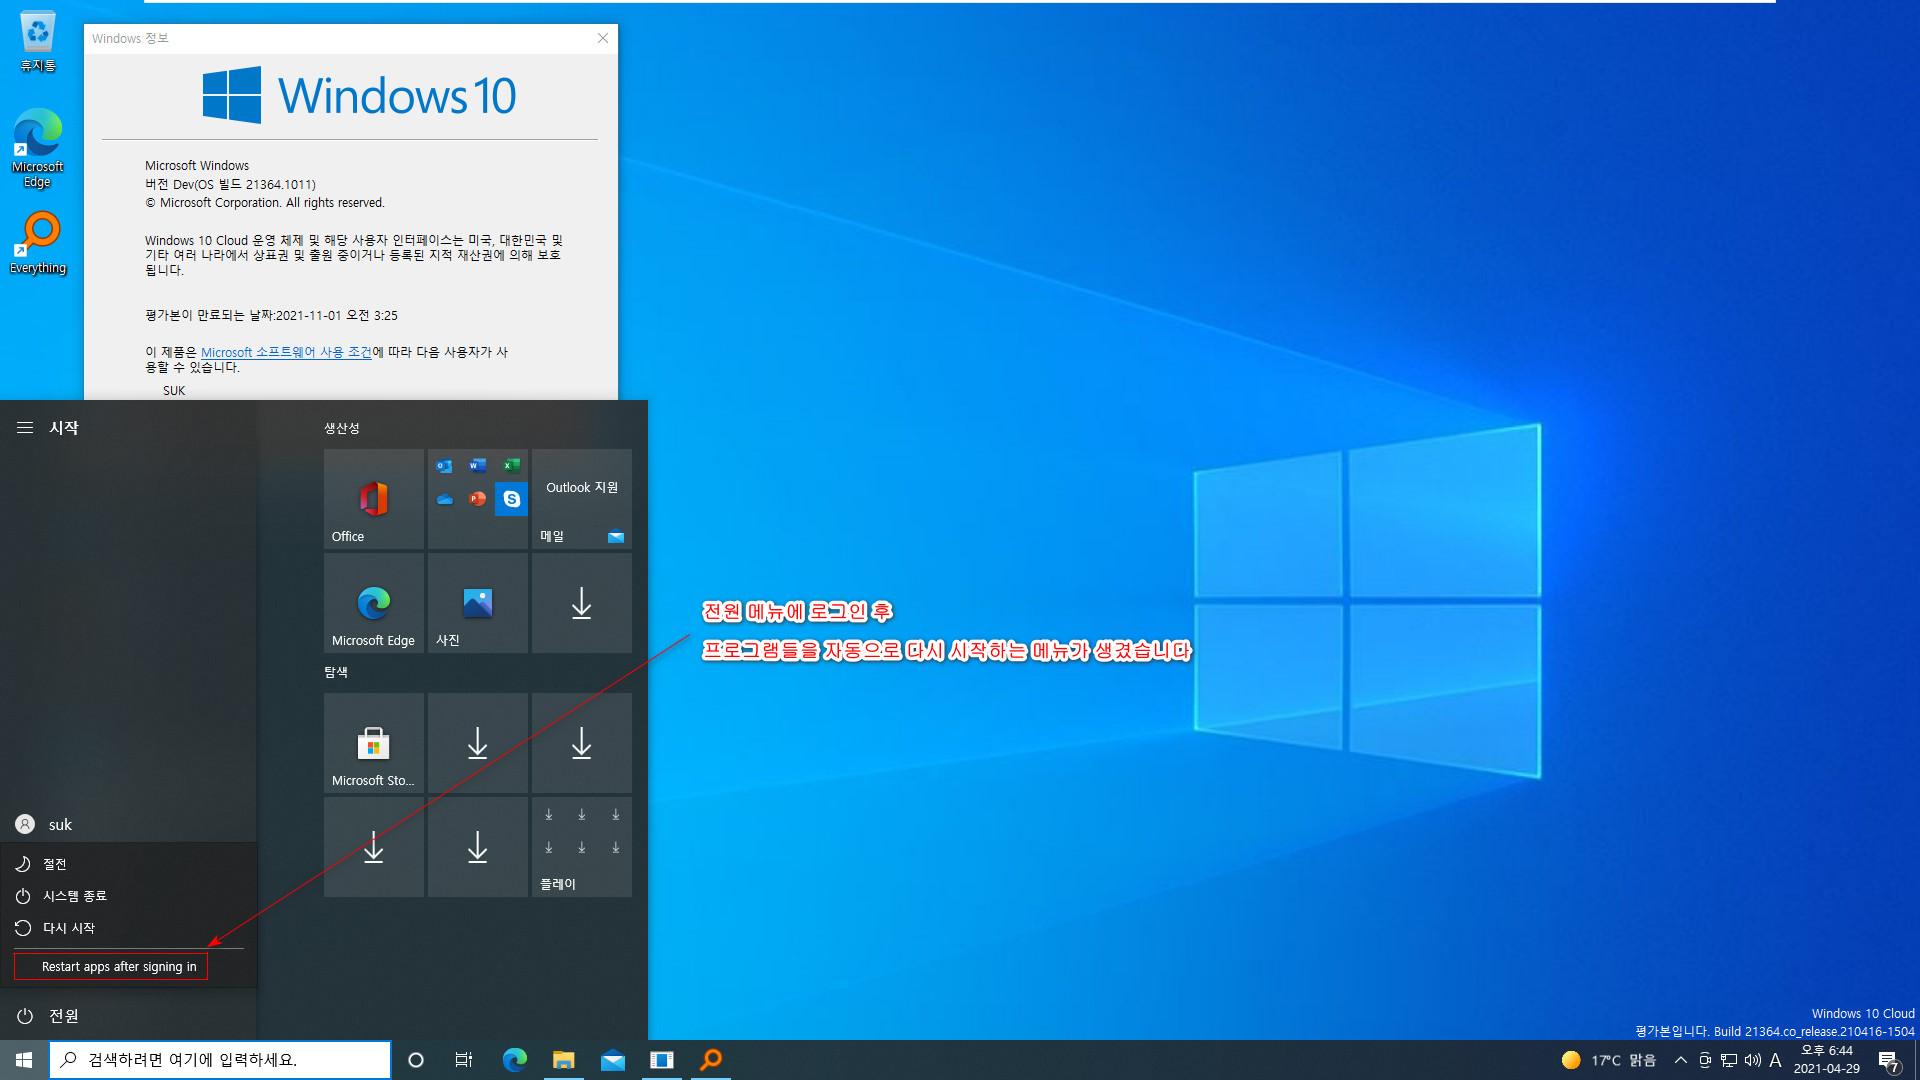 Windows 10 인사이더 프리뷰 버전 Dev (버전 21H2 예상) 21364 빌드에 Cloud Edition 설치 + Pro와 전환 테스트 = 잘 전환됩니다 2021-04-29_184435.jpg